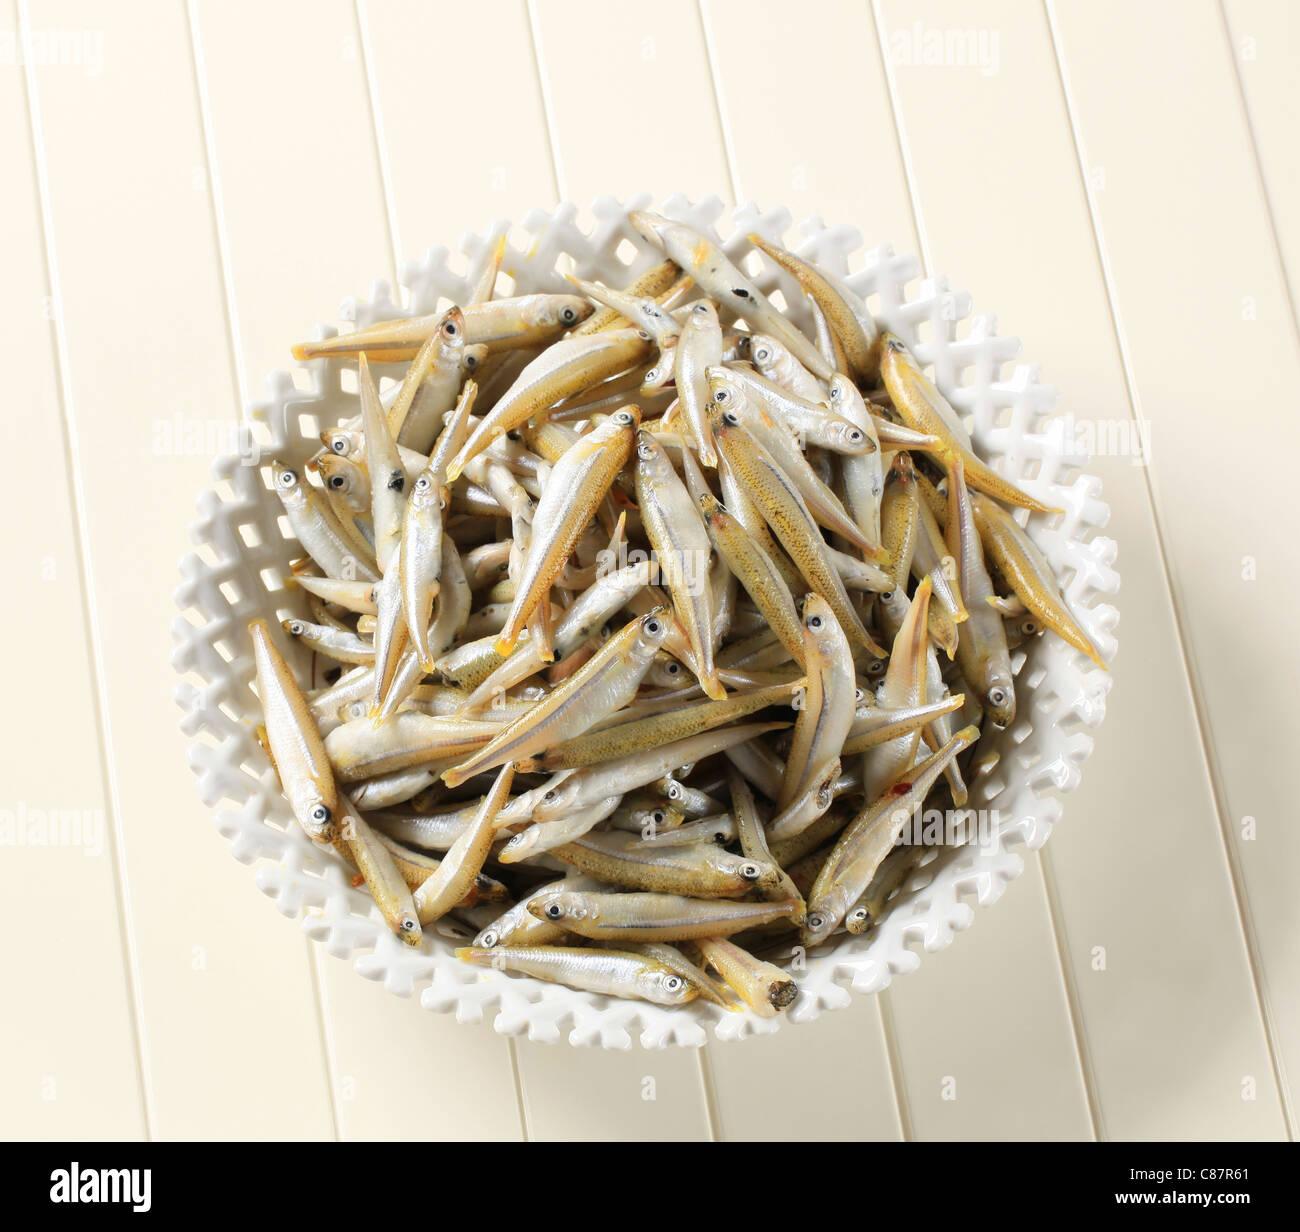 Bowl of fresh sprats - Stock Image